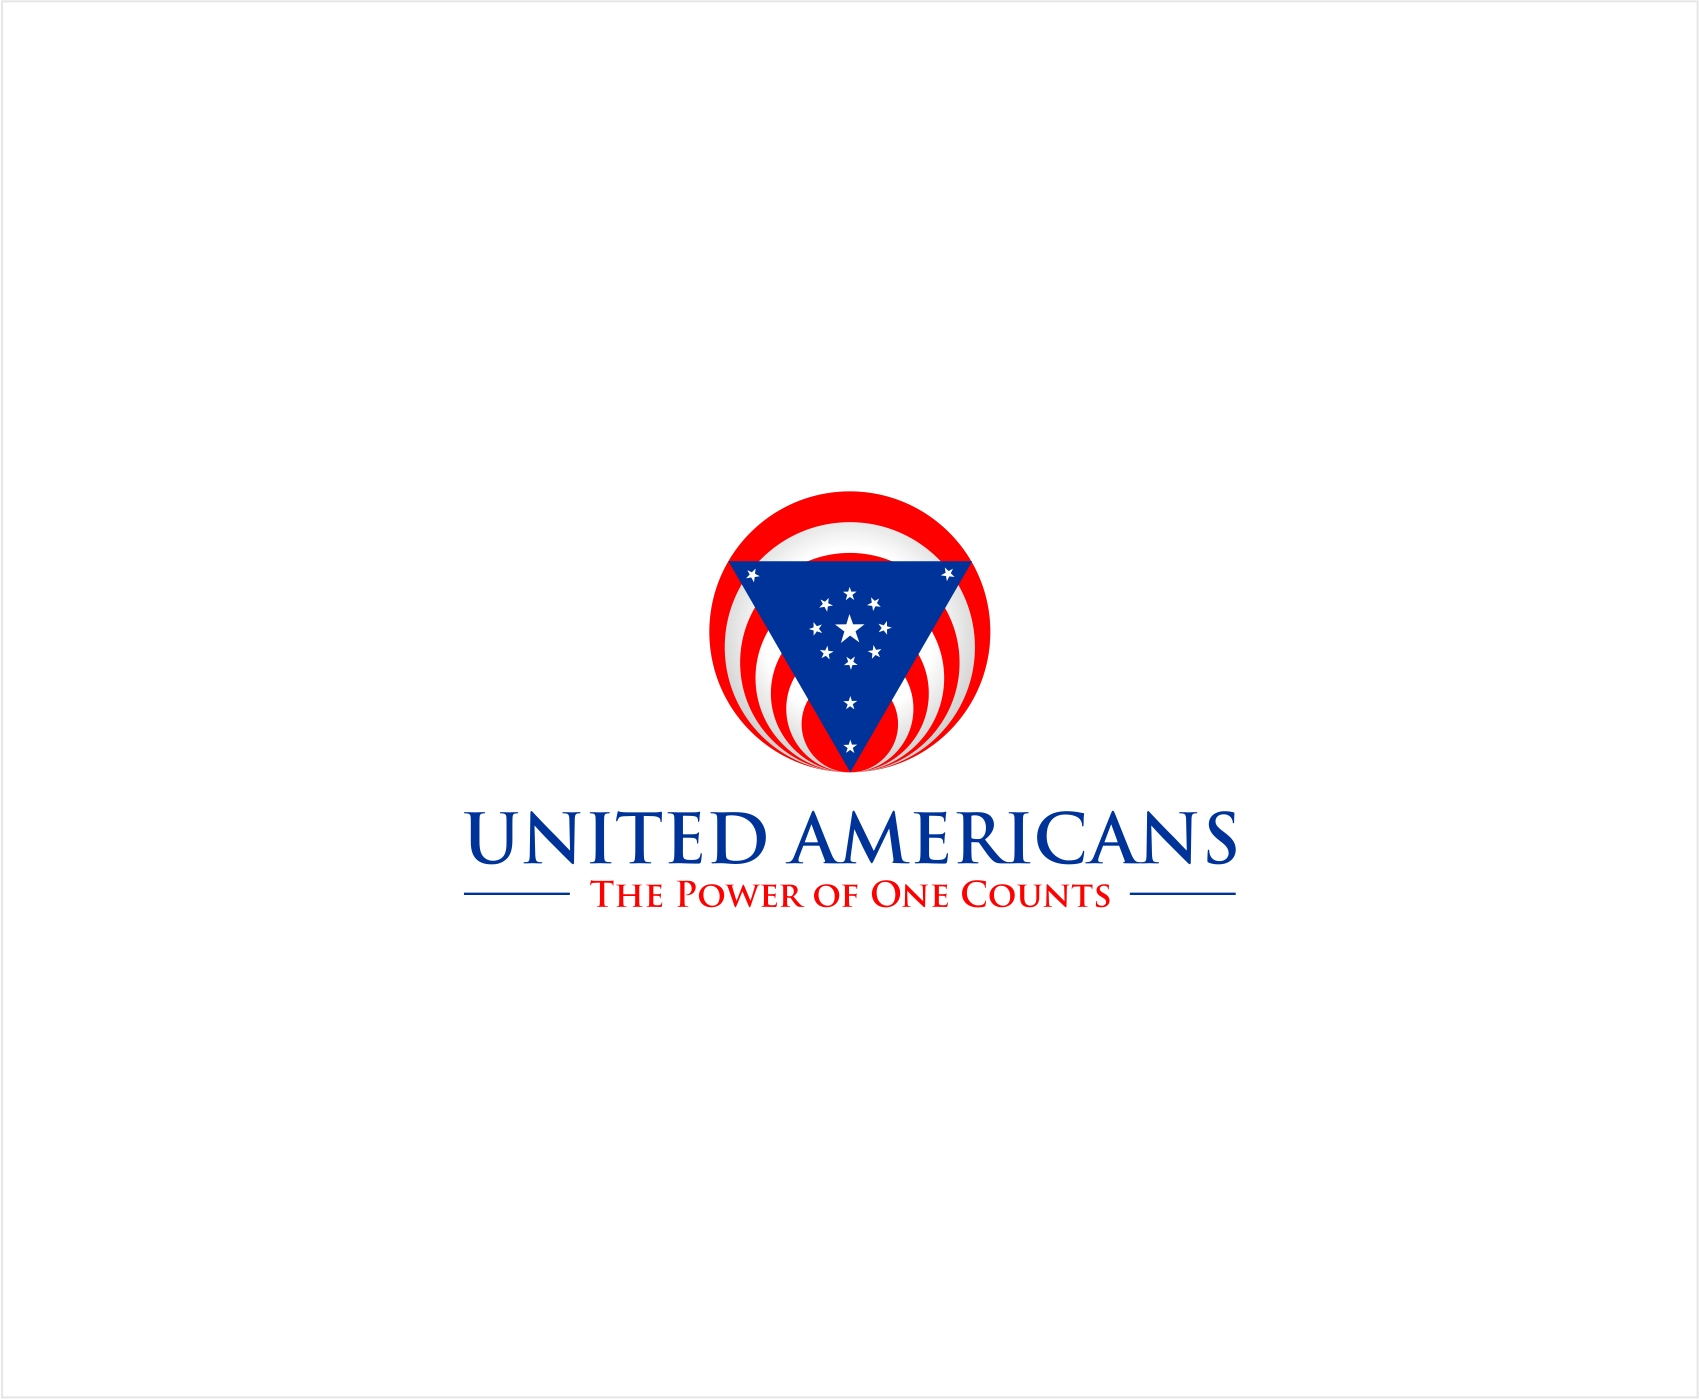 Logo Design by haidu - Entry No. 51 in the Logo Design Contest Creative Logo Design for United Americans.